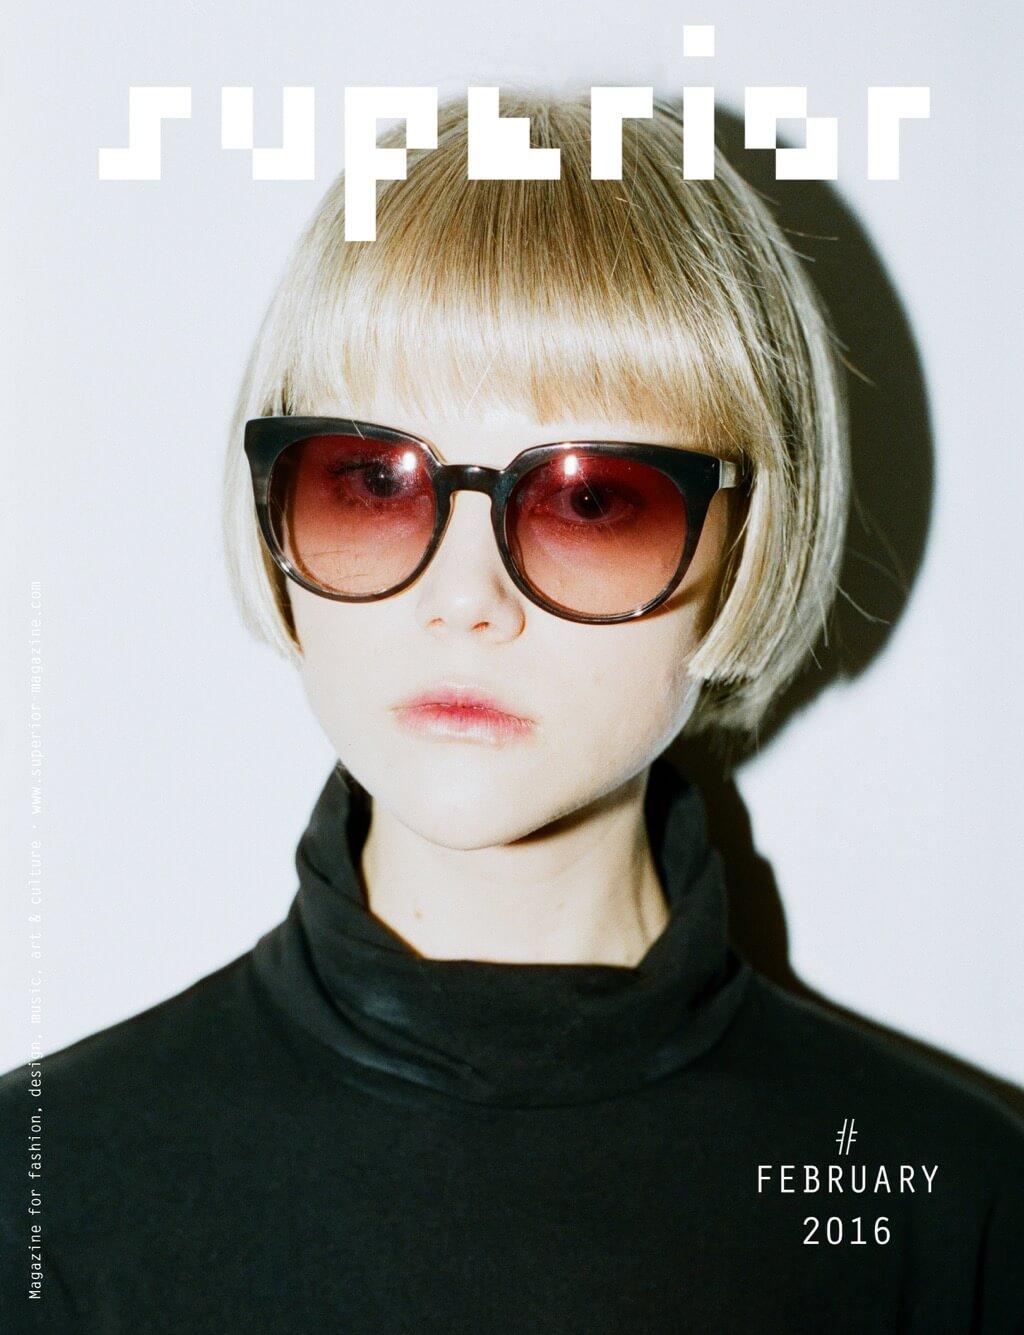 Superior Magazine # February 2016